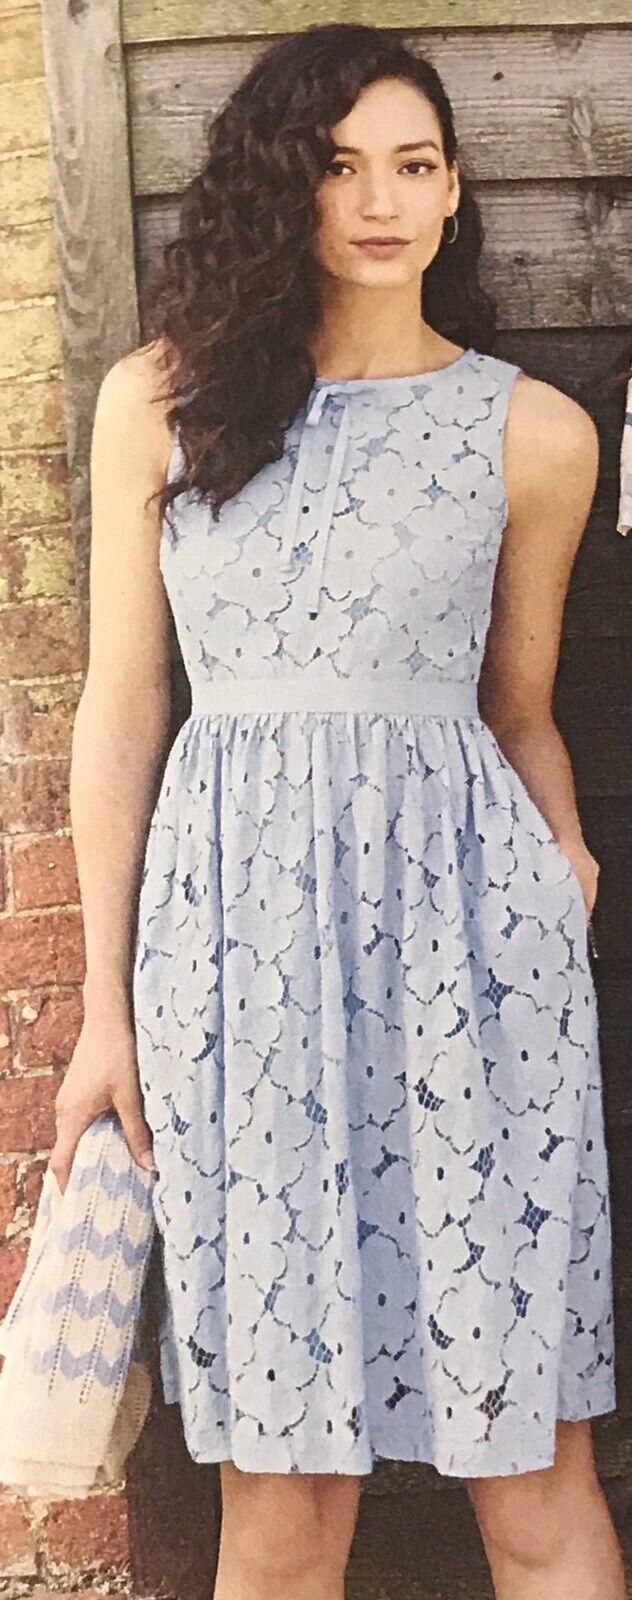 Cath Kidston Summer cool dentelle Blaue robe sans manches Größe 14 Bnwt